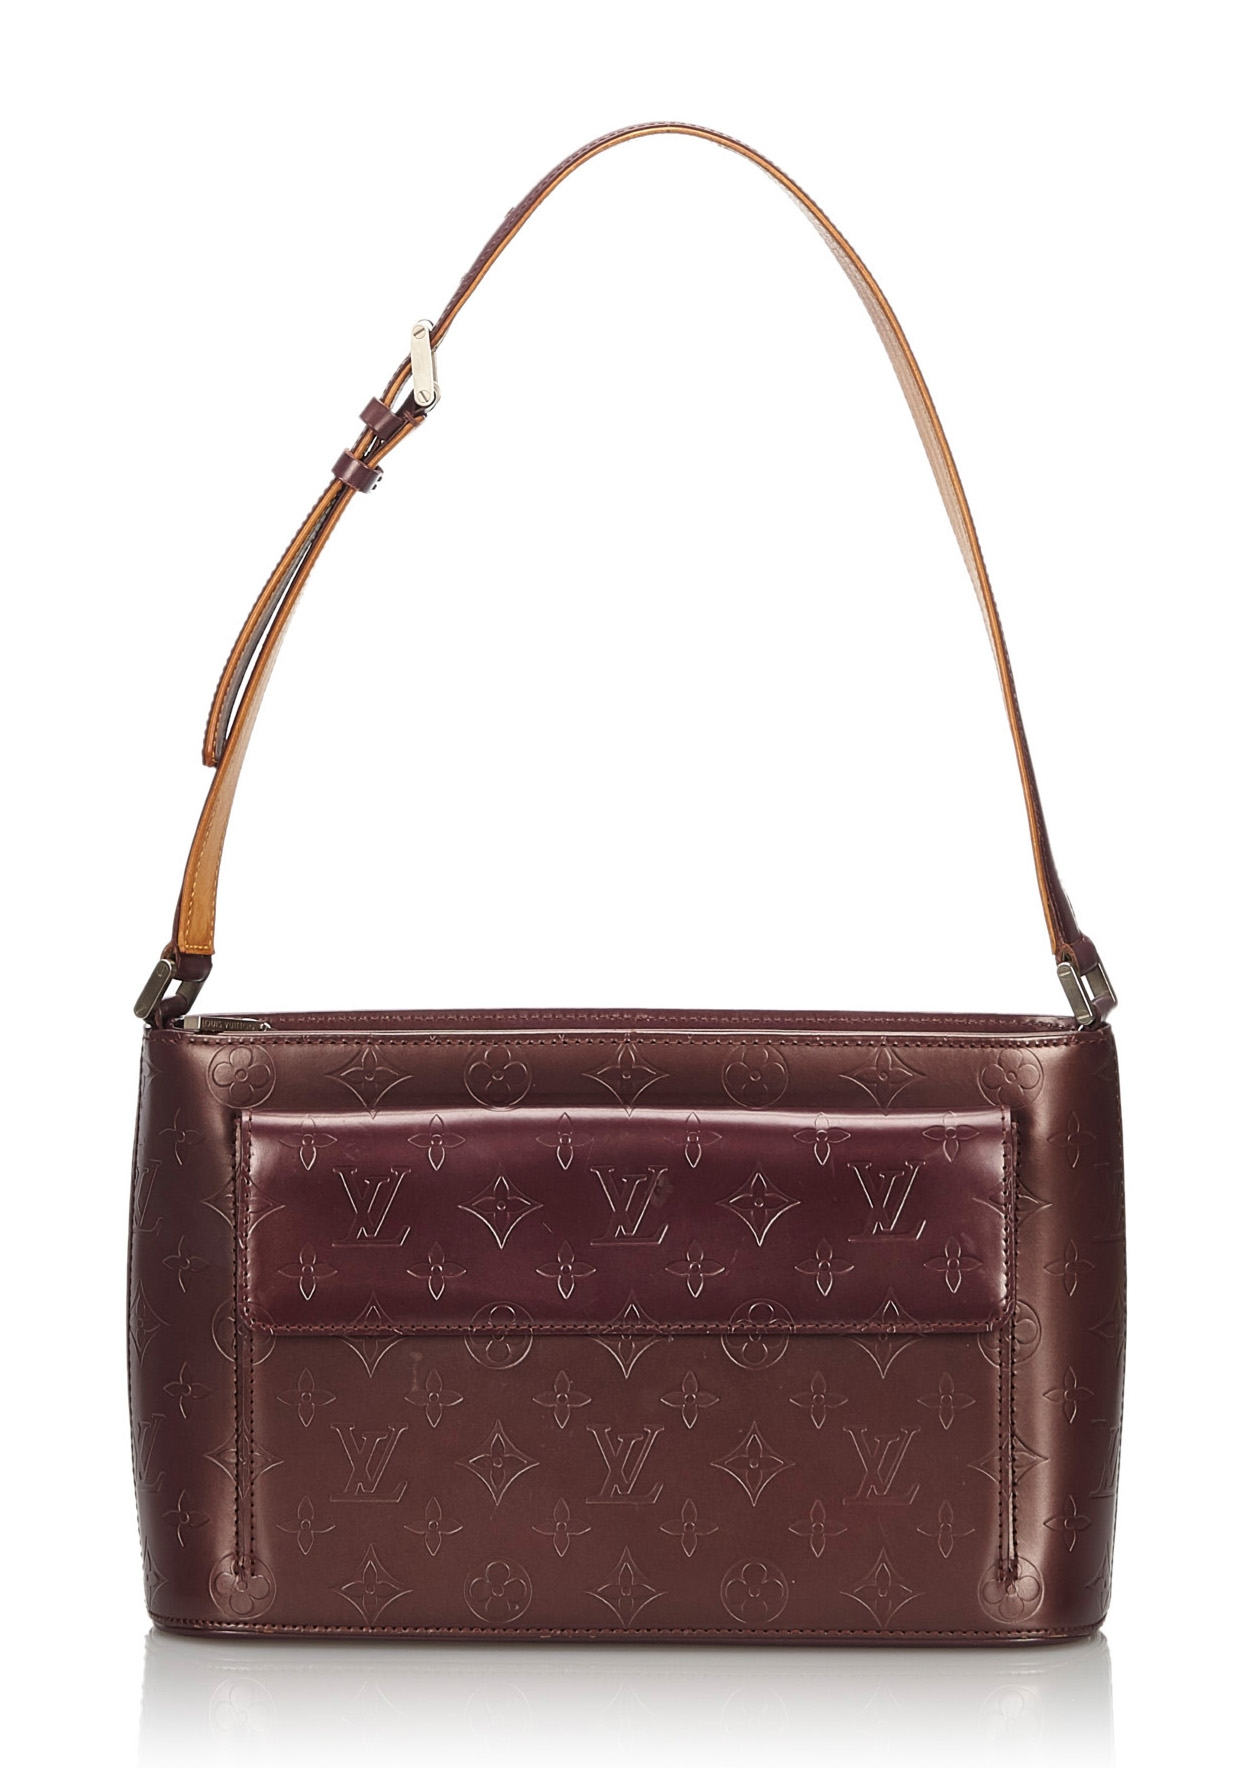 Dark Brown leather Shoulder Pad for your bag straps.